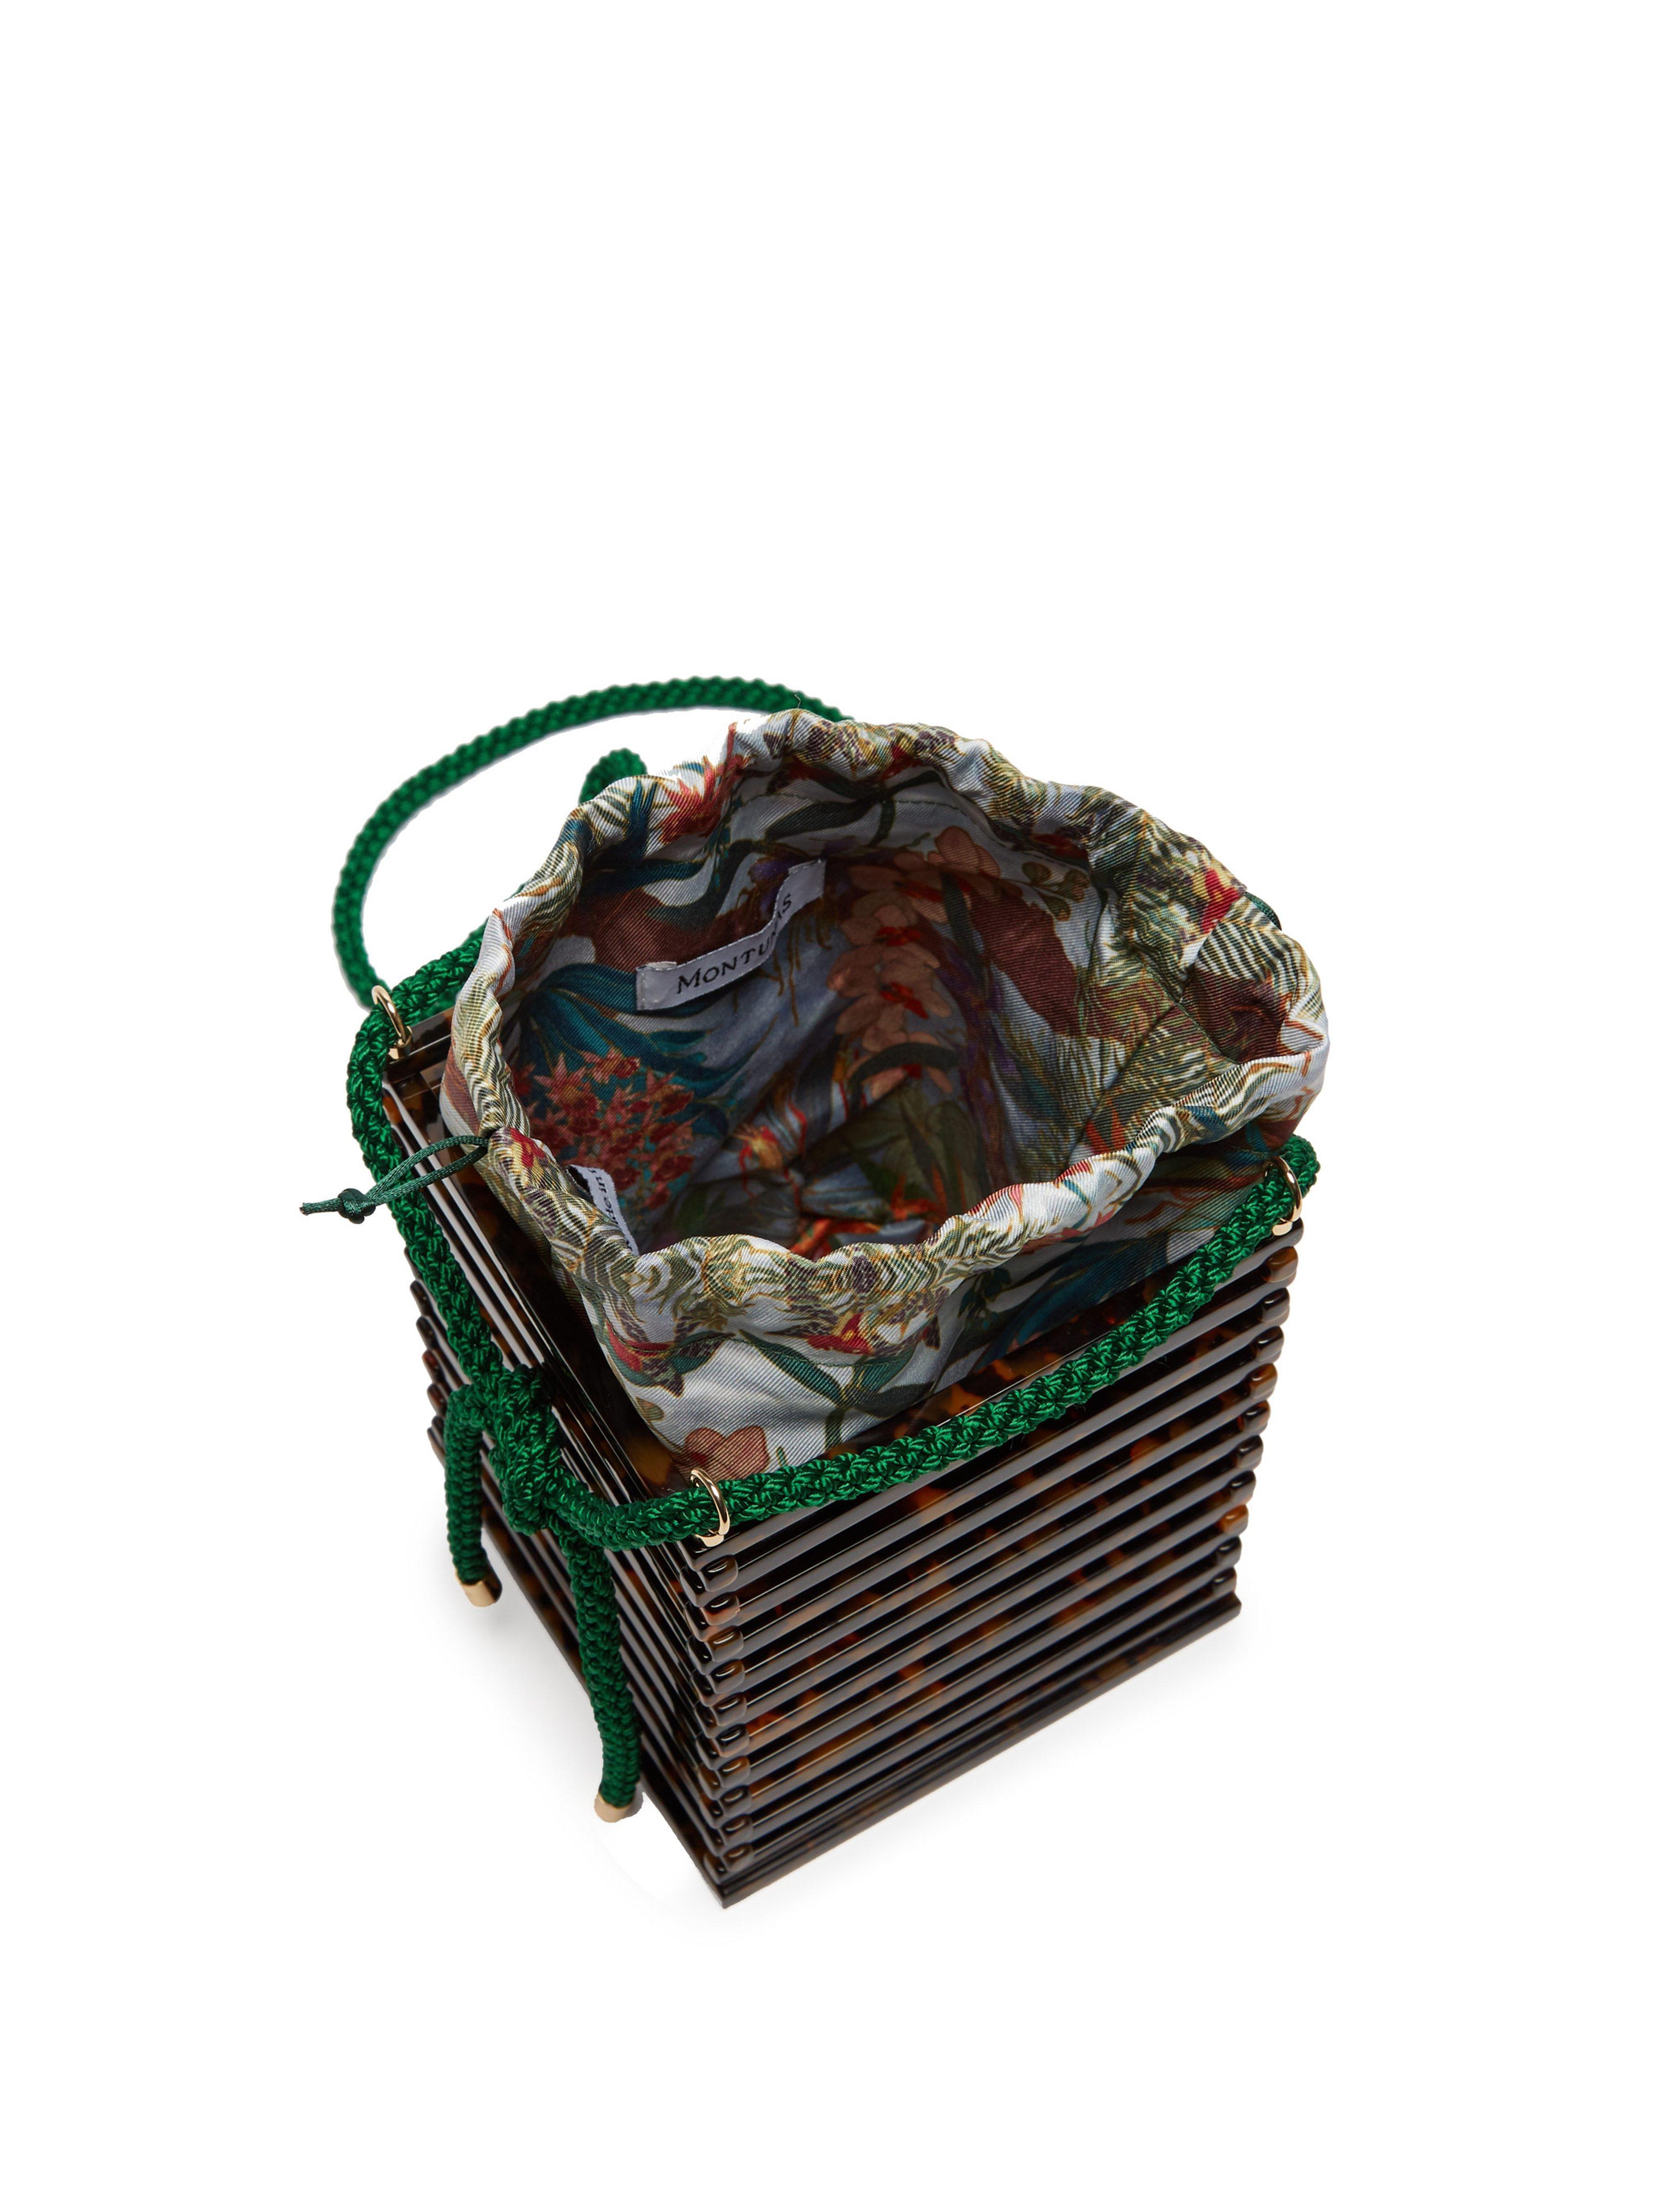 10c9edbabe ... Vanda Acetate Box Bag - Lyst. Visit MATCHESFASHION.COM. Tap to visit  site